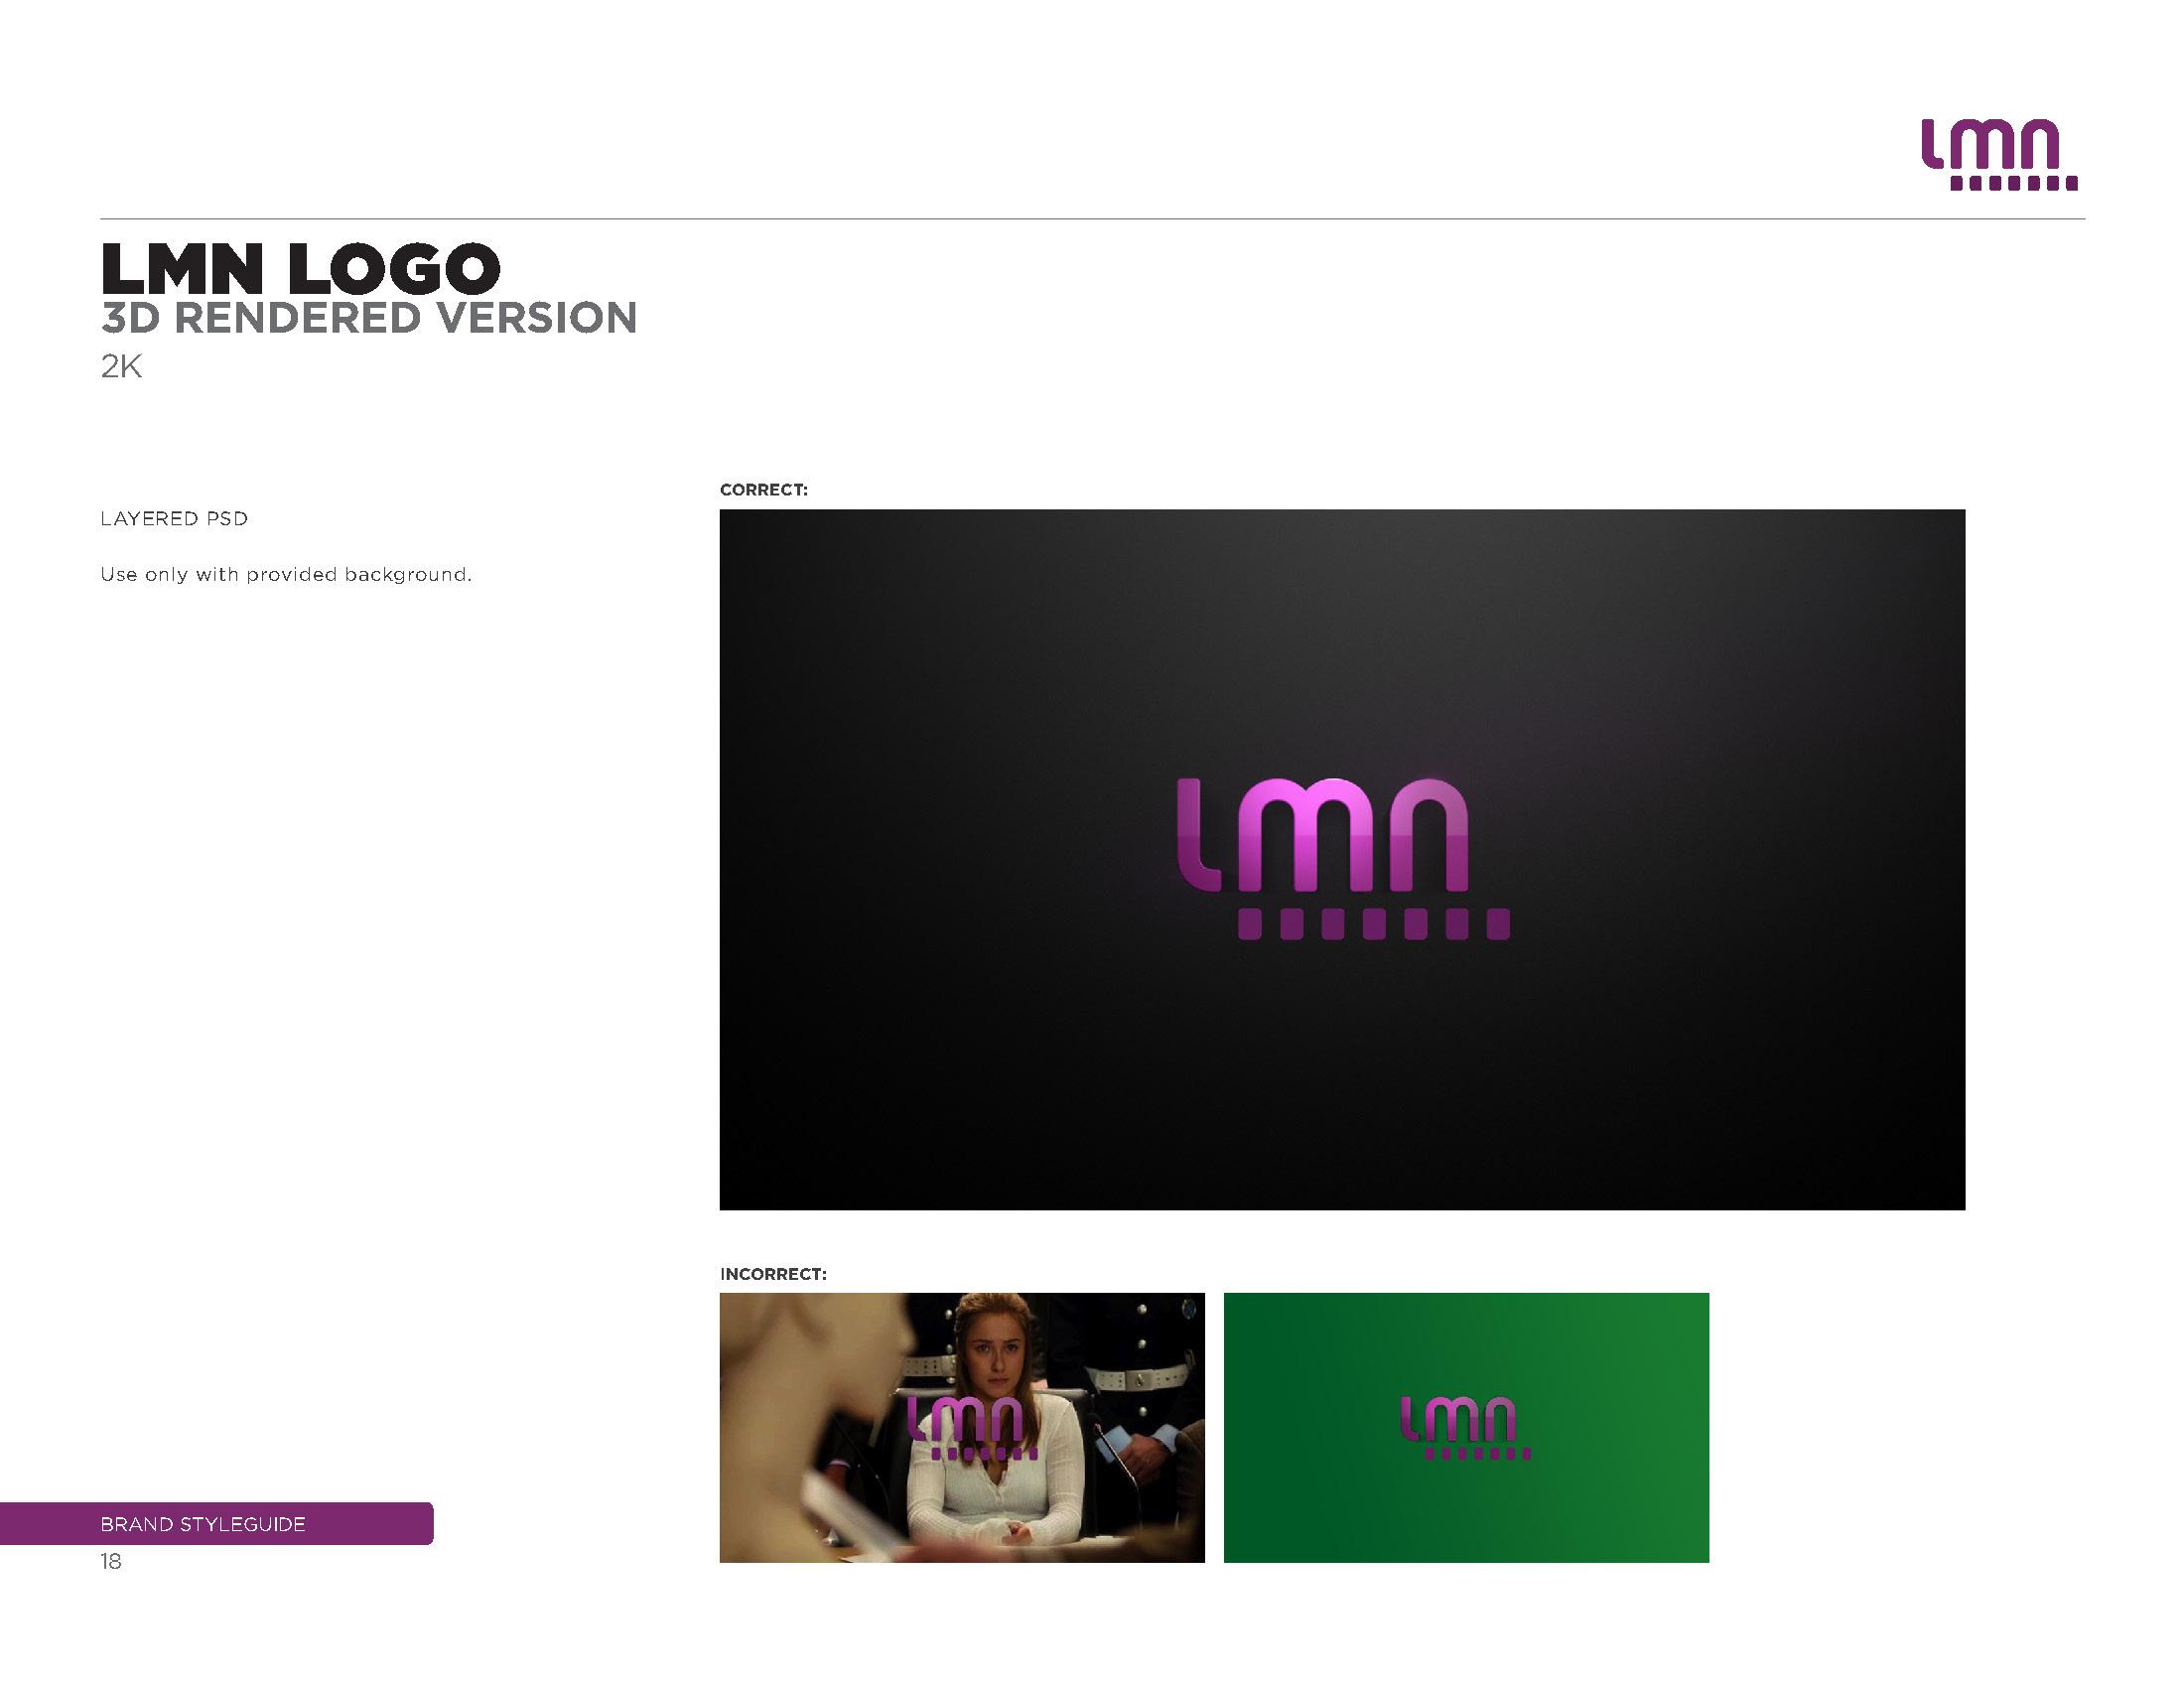 LMN_styleguide_092711_HQ_Page_18.jpg